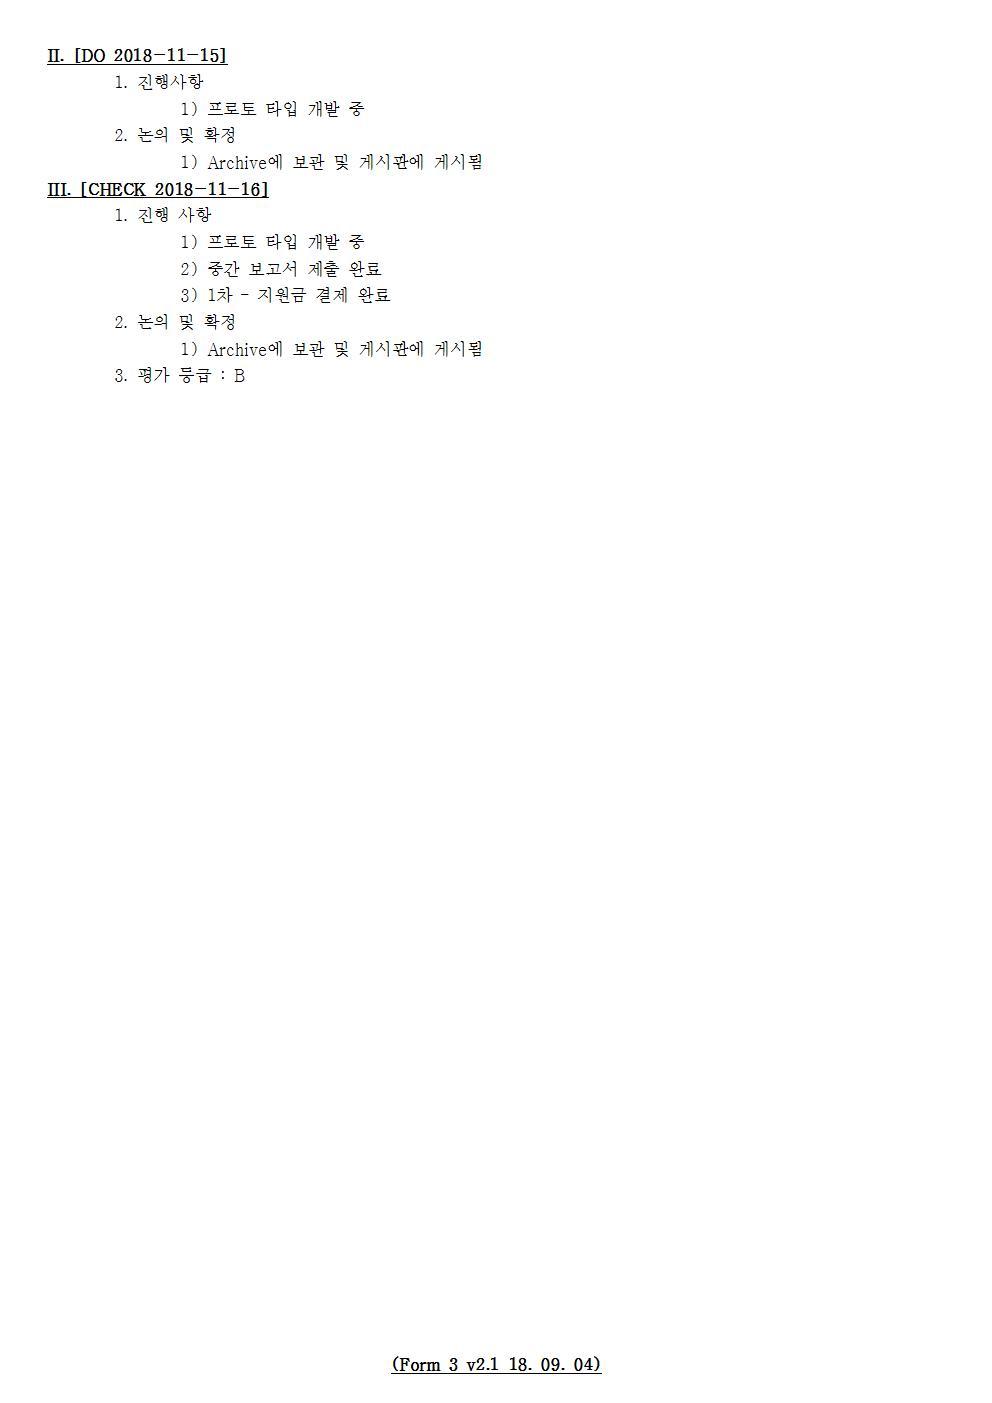 D-[18-049-LC-02]-[MM]-[2018-11-16][HH]002.jpg